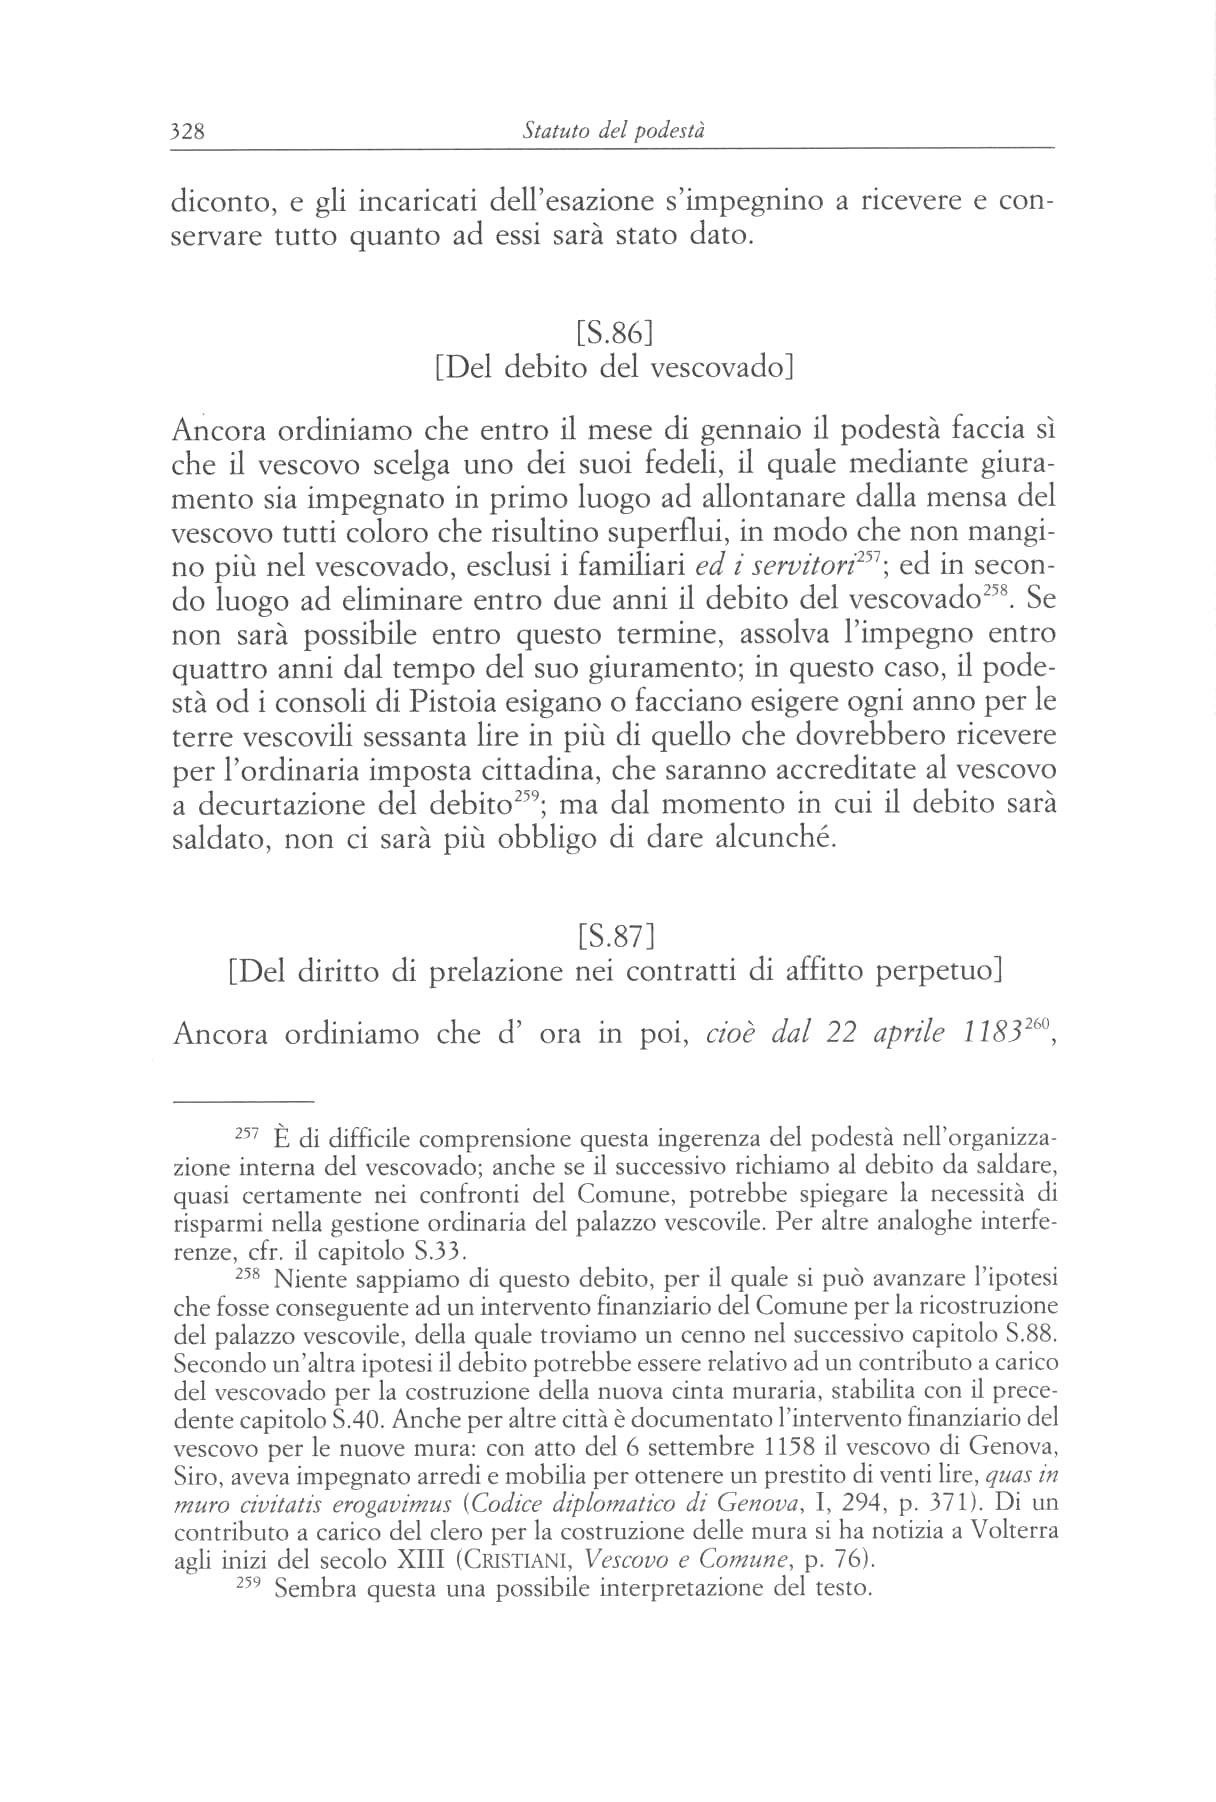 statuti pistoiesi del sec.XII 0328.jpg